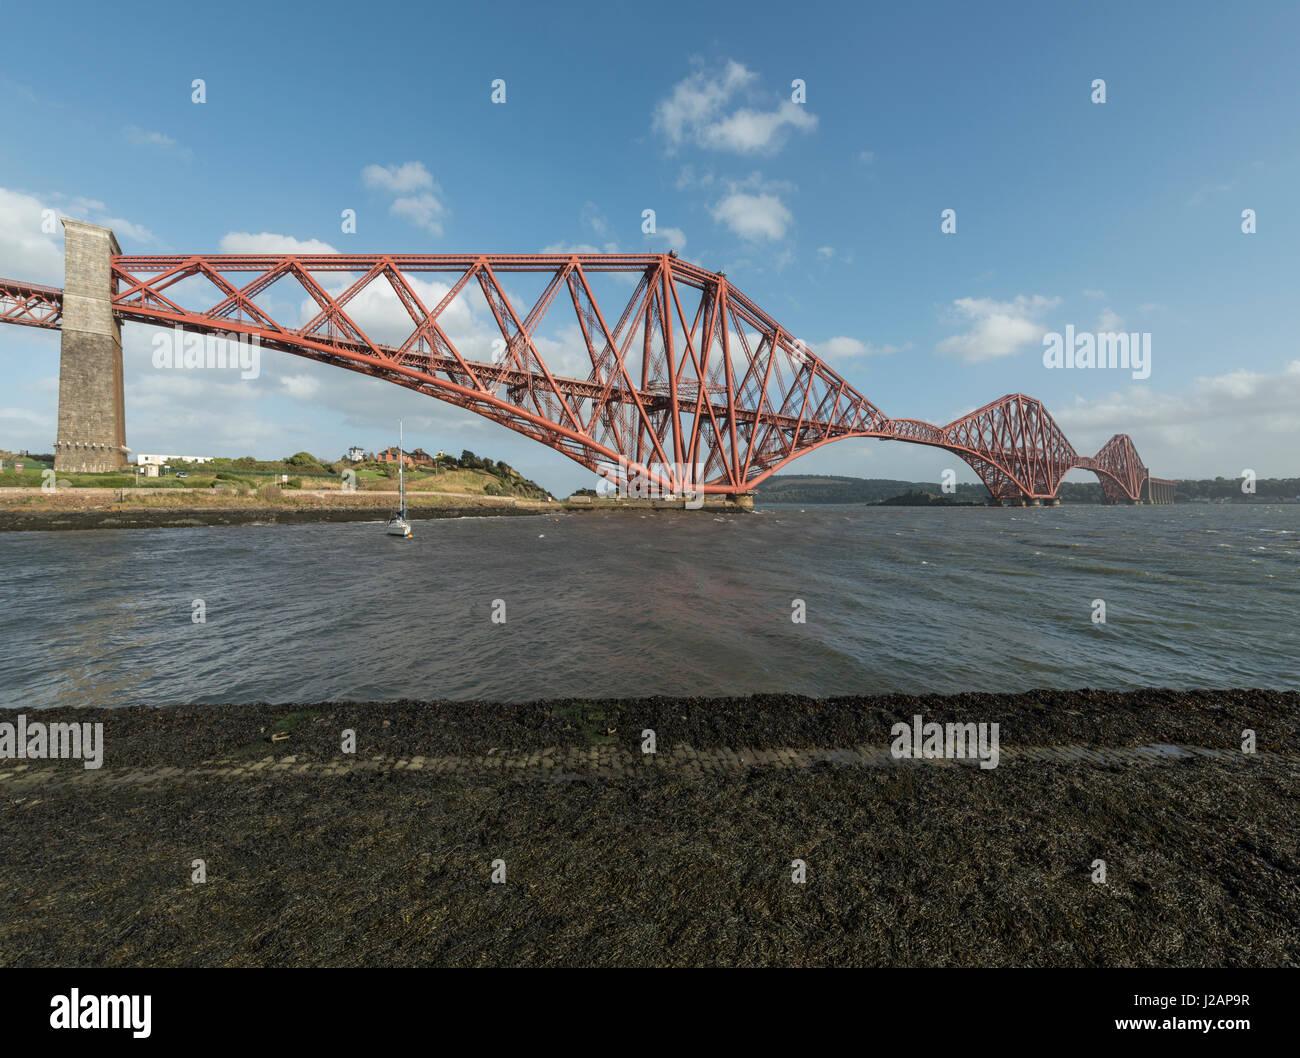 Forth bridge looking south, North Queensferry, Scotland, United Kingdom Stock Photo